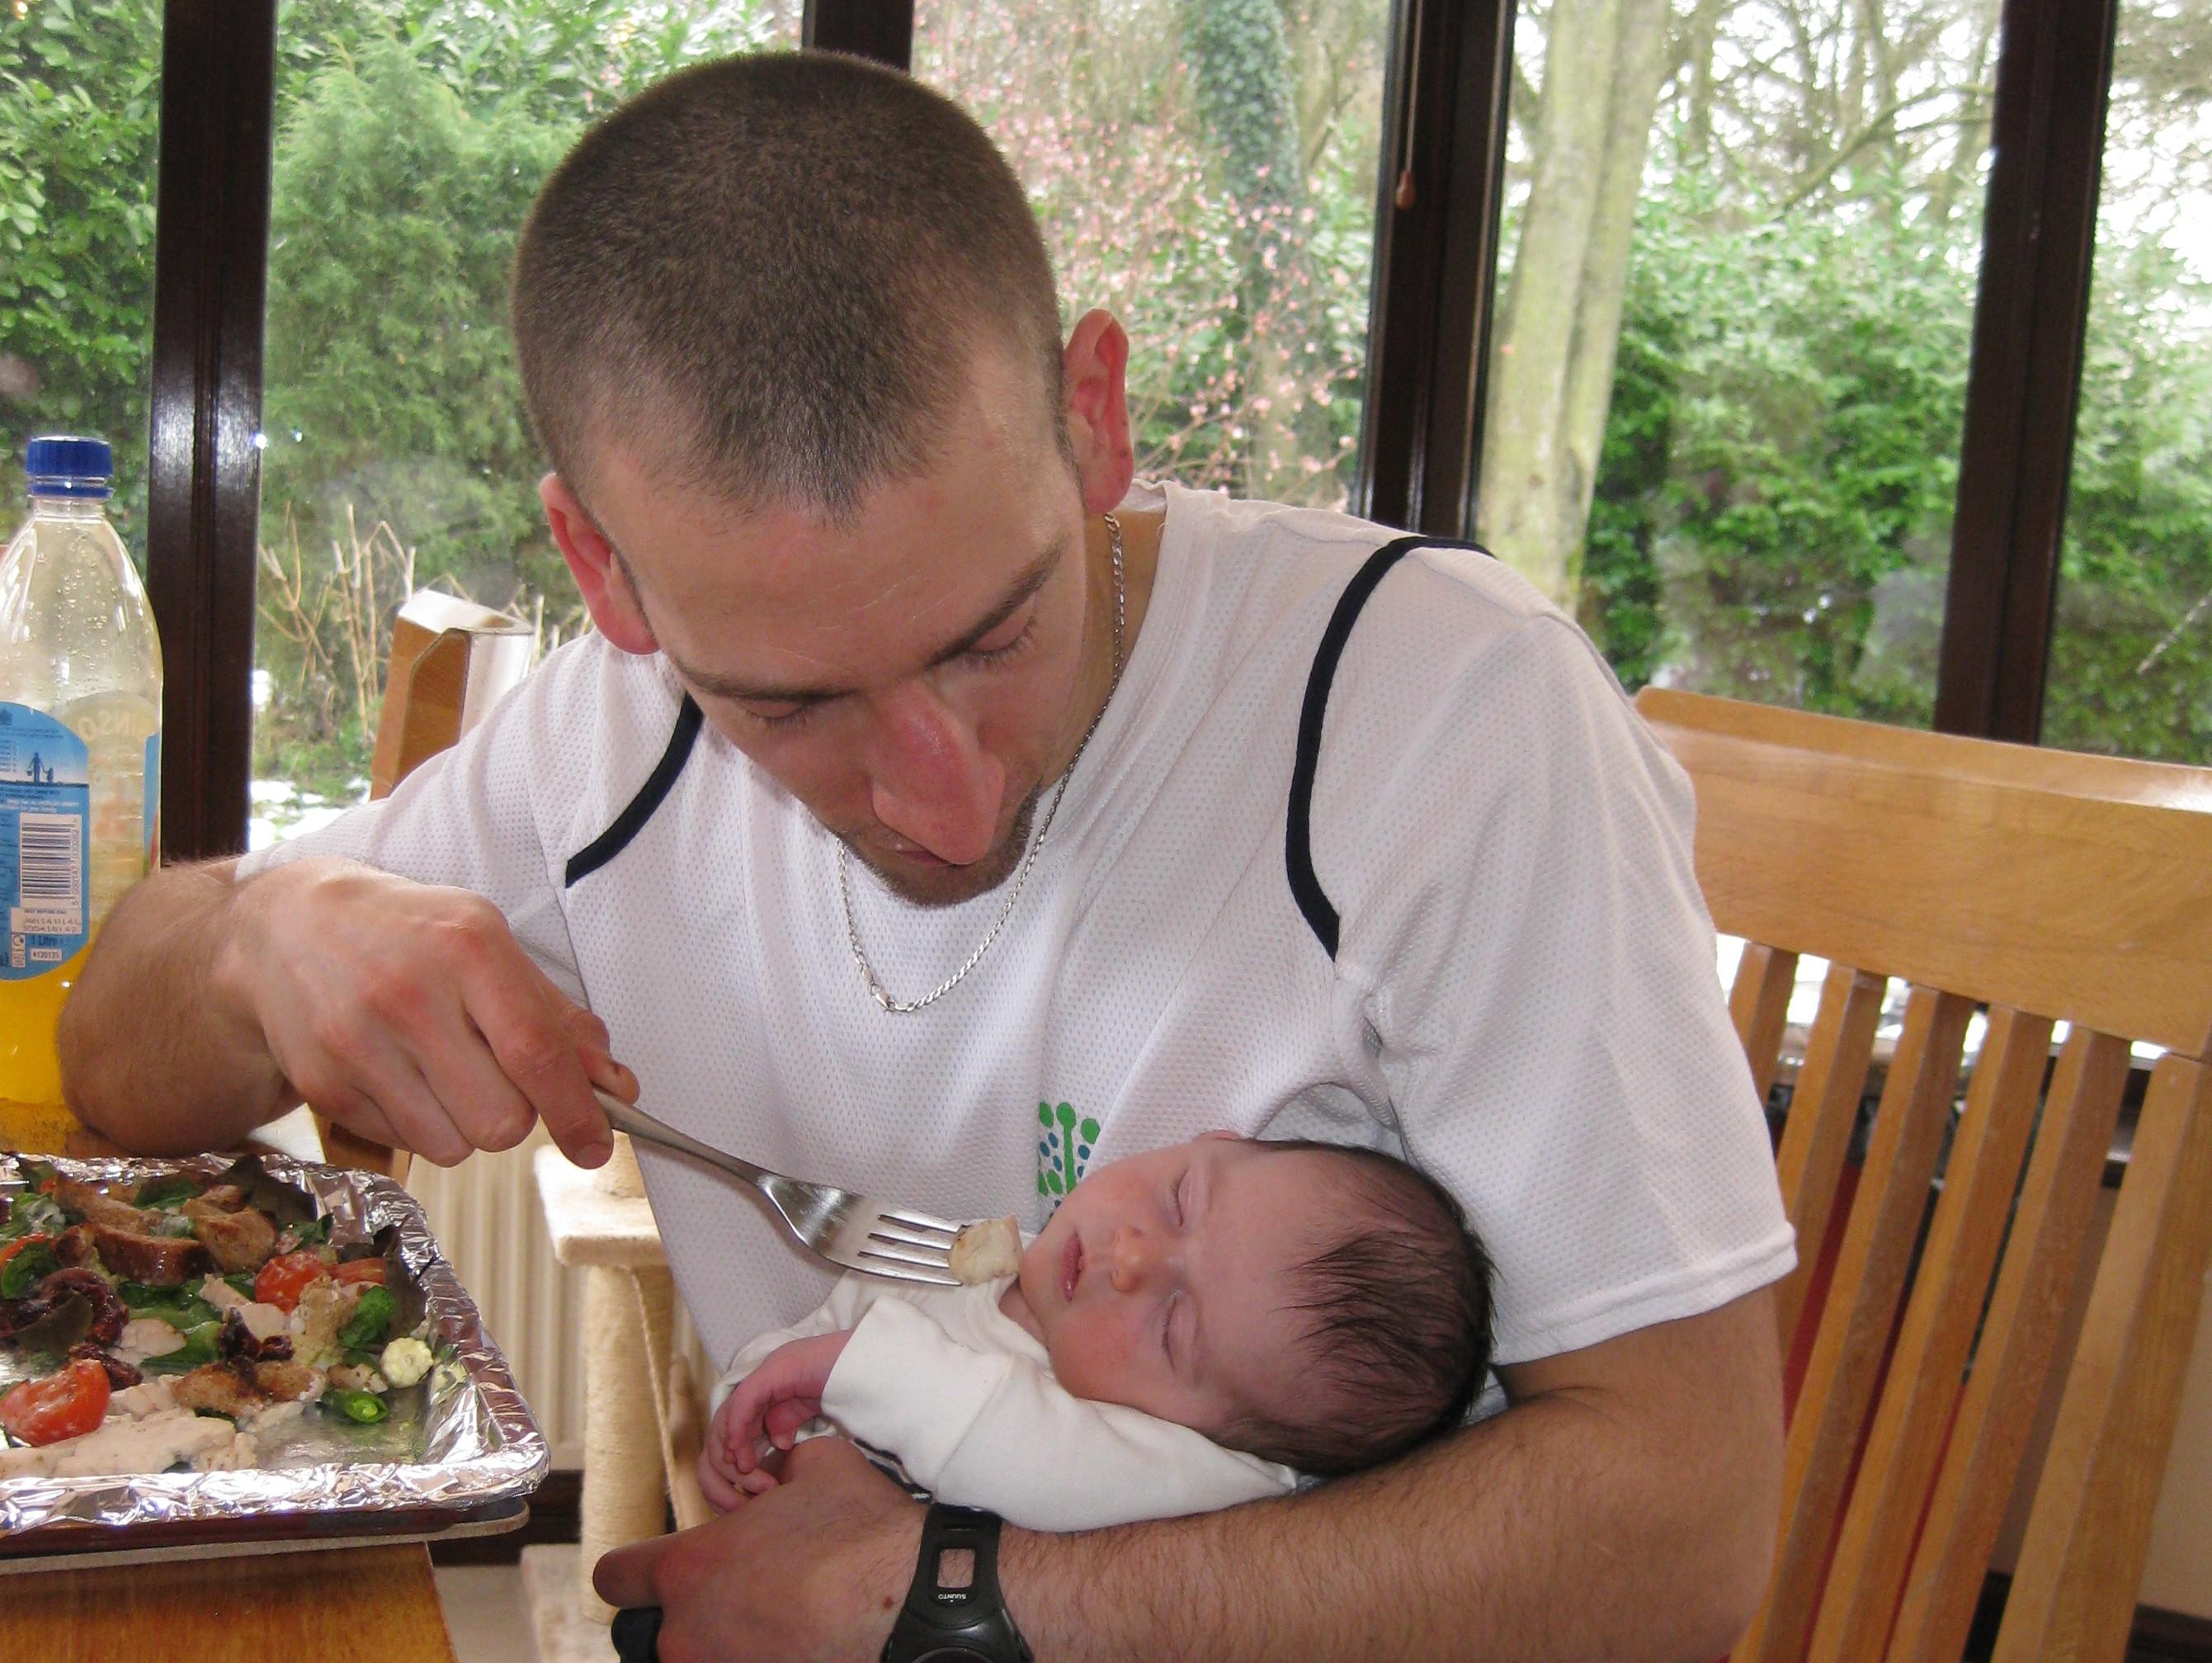 Steve feeding baby